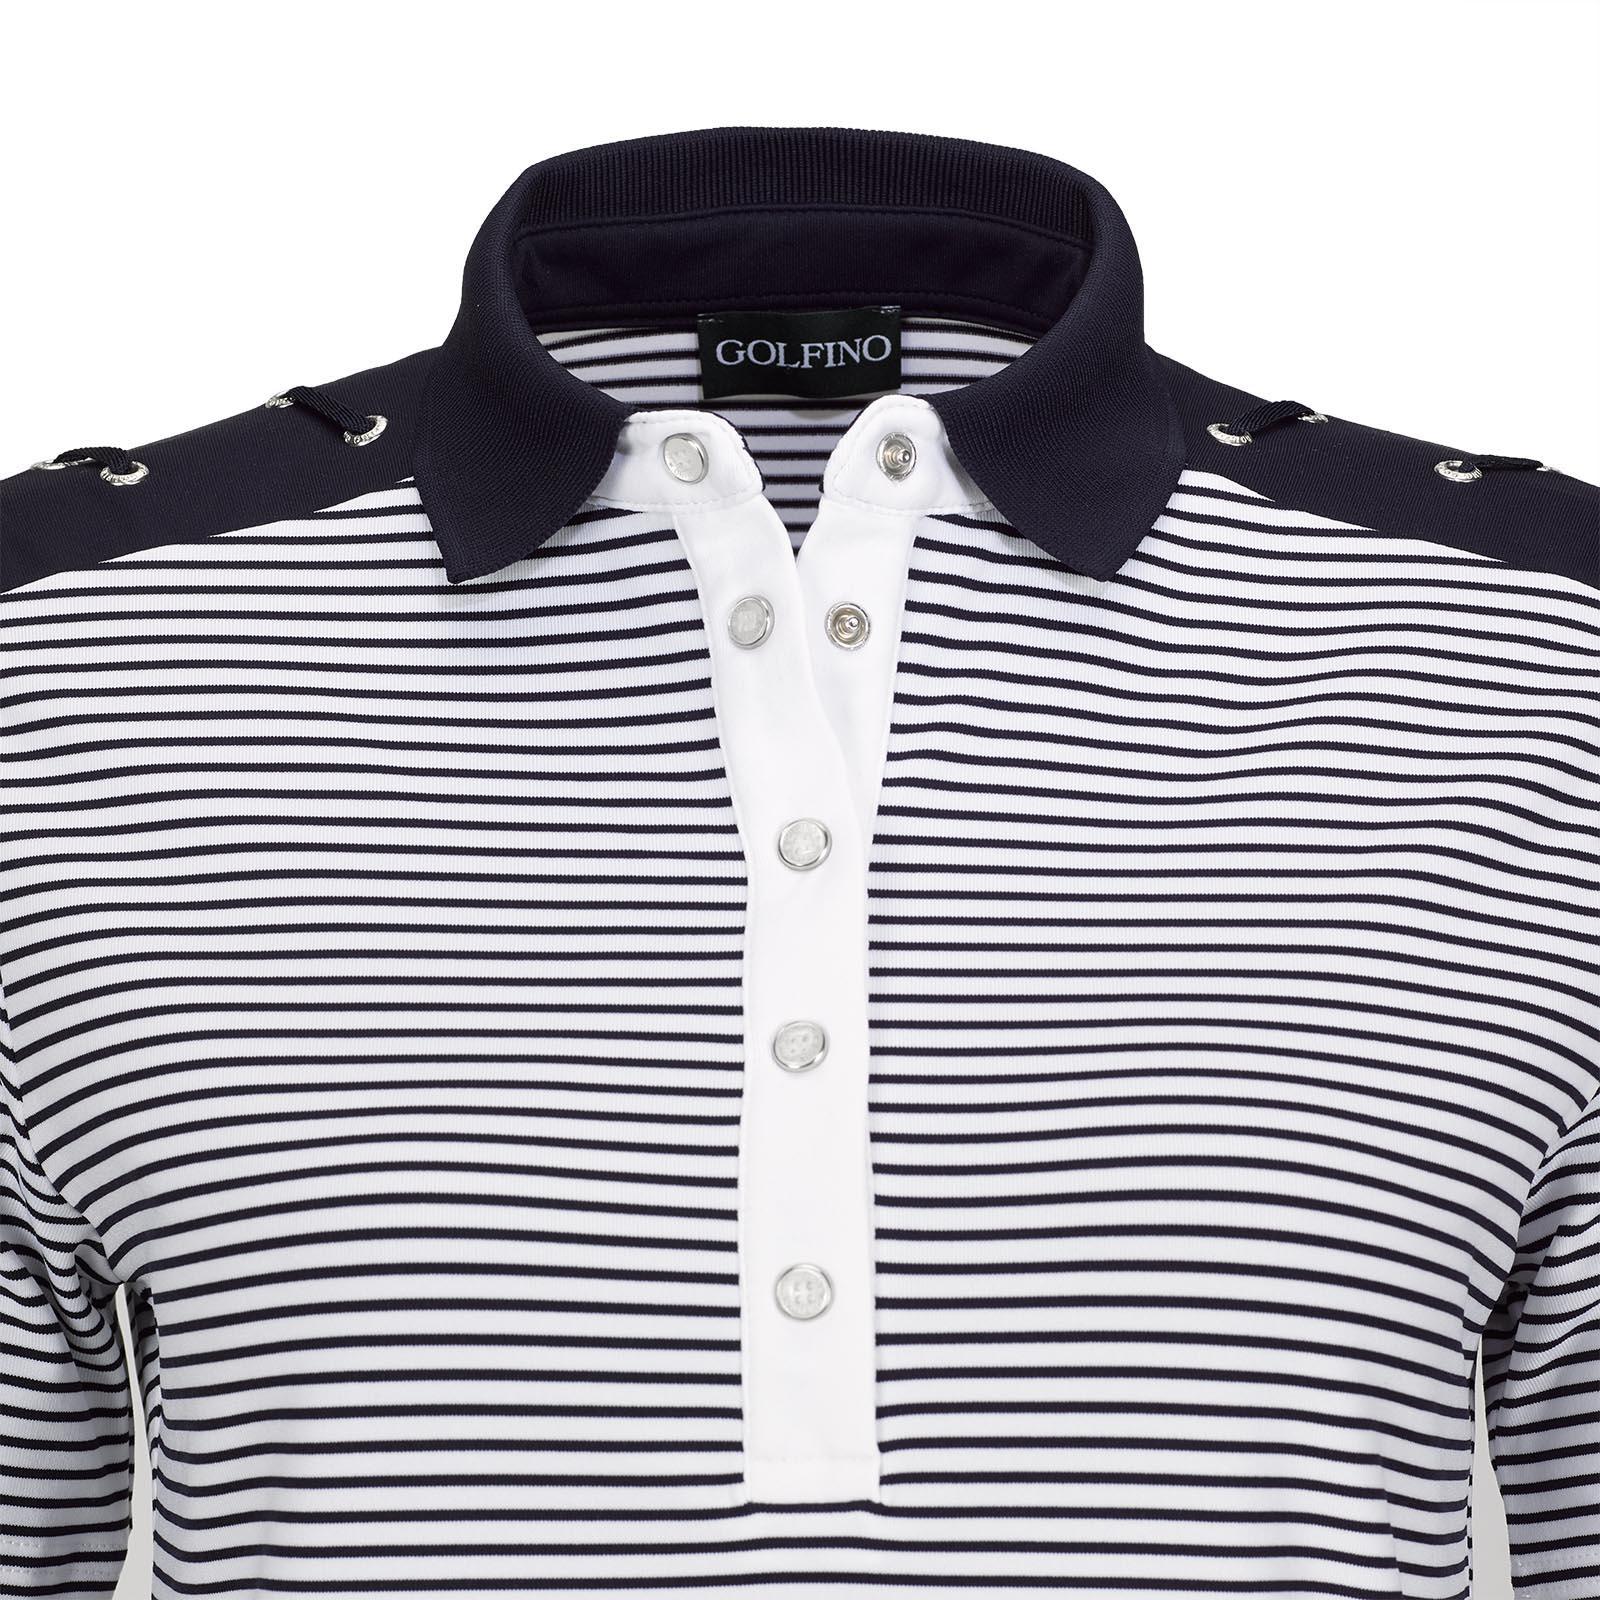 Kurzarm Damen Golfpolo Nautical Stripes mit Moisture Management